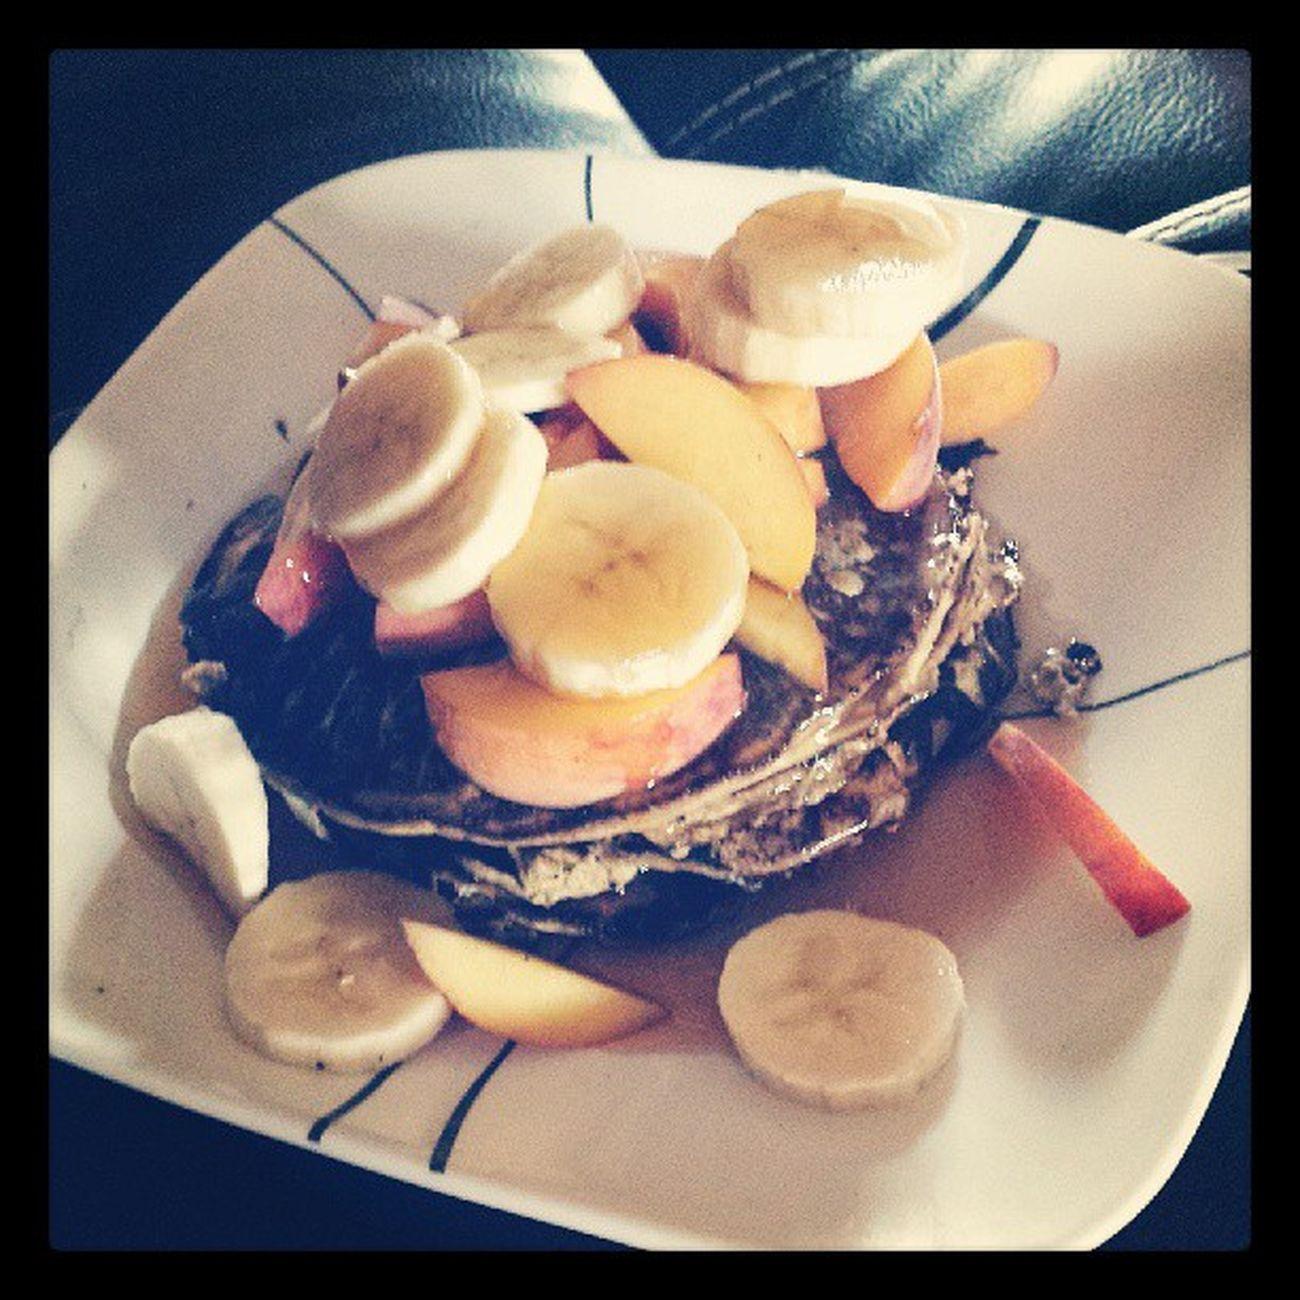 Wheyproteinpancakes Yumm Nocarbs Nofat nosugar paleo healthygirl healthyfuel goodmorning